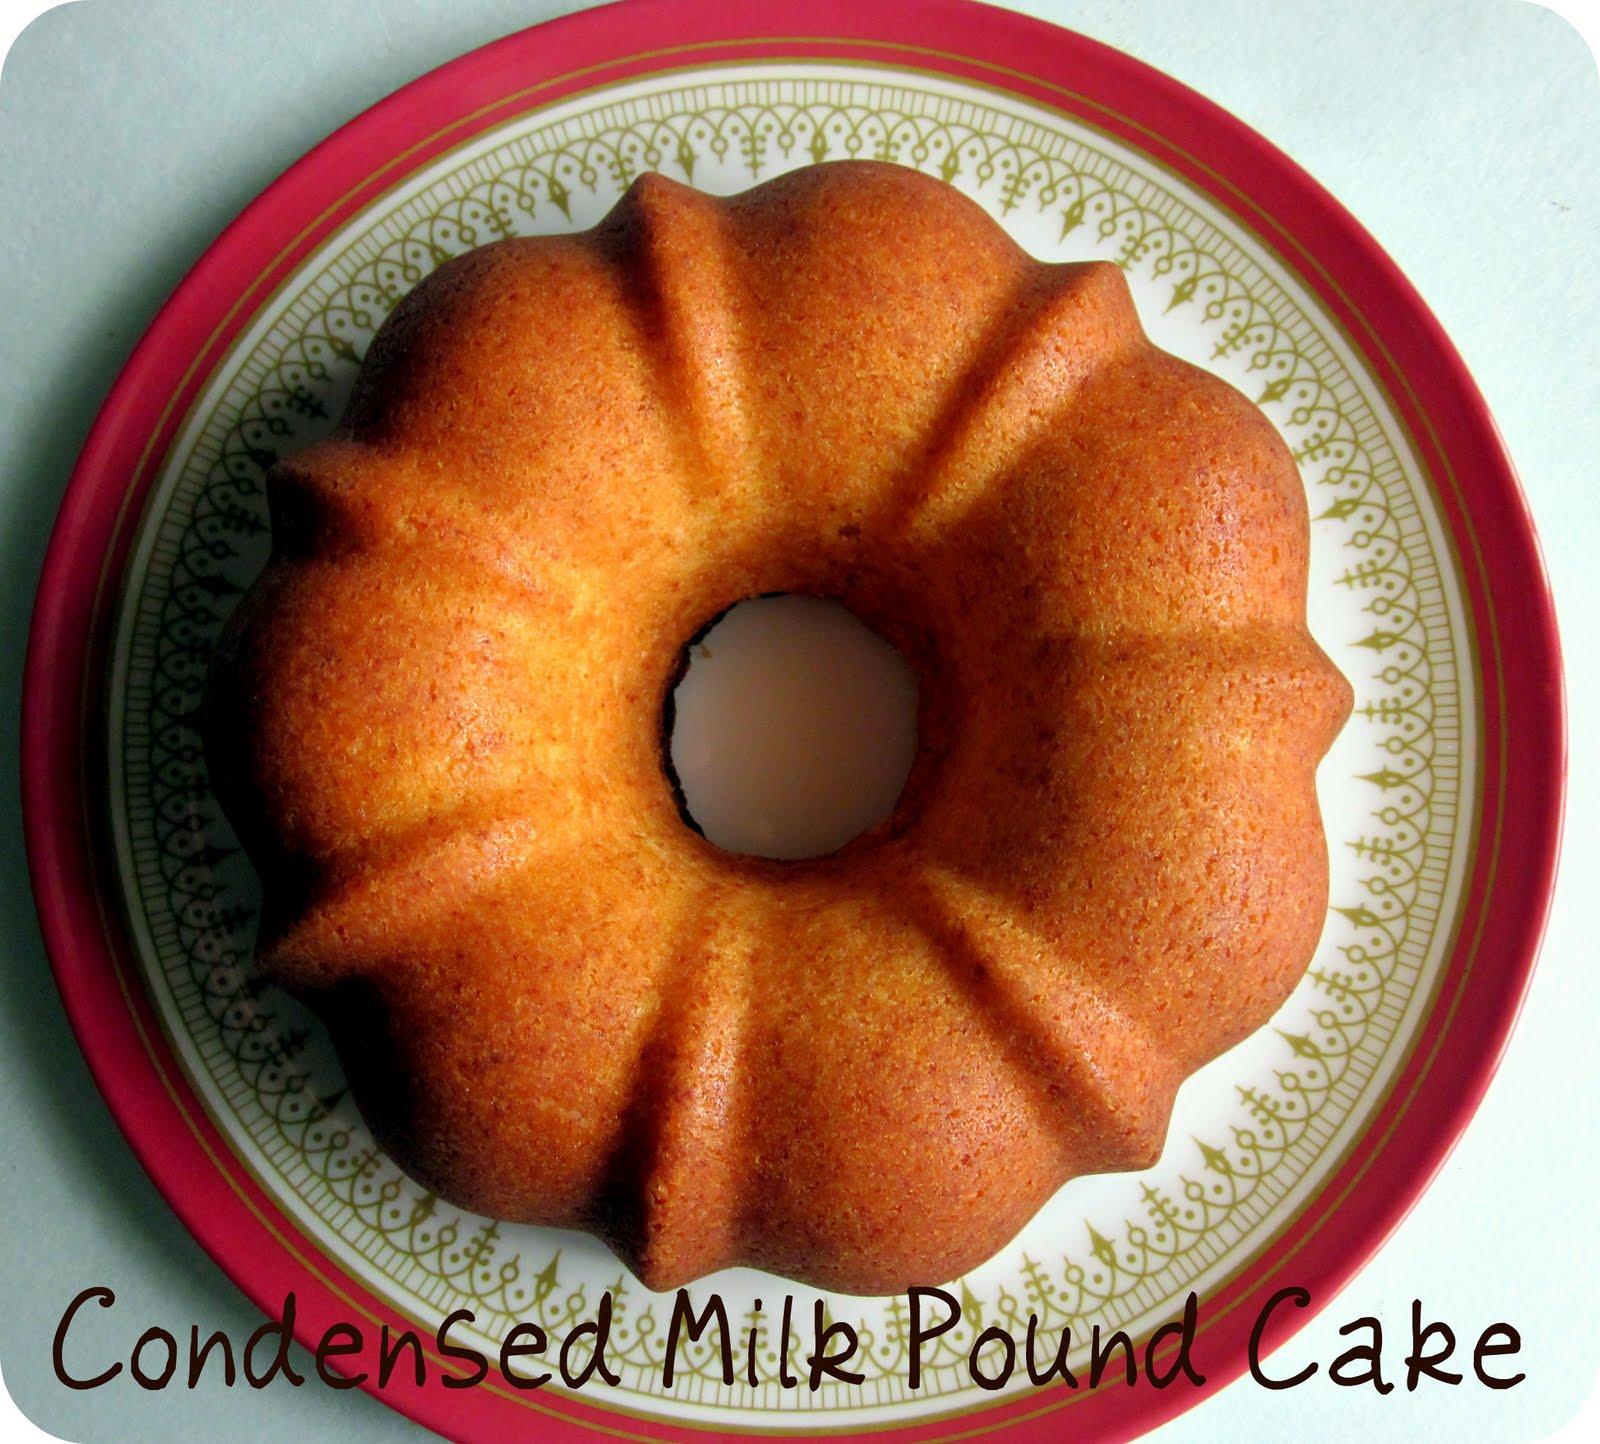 Easycooking Condensed Milk Pound Cake